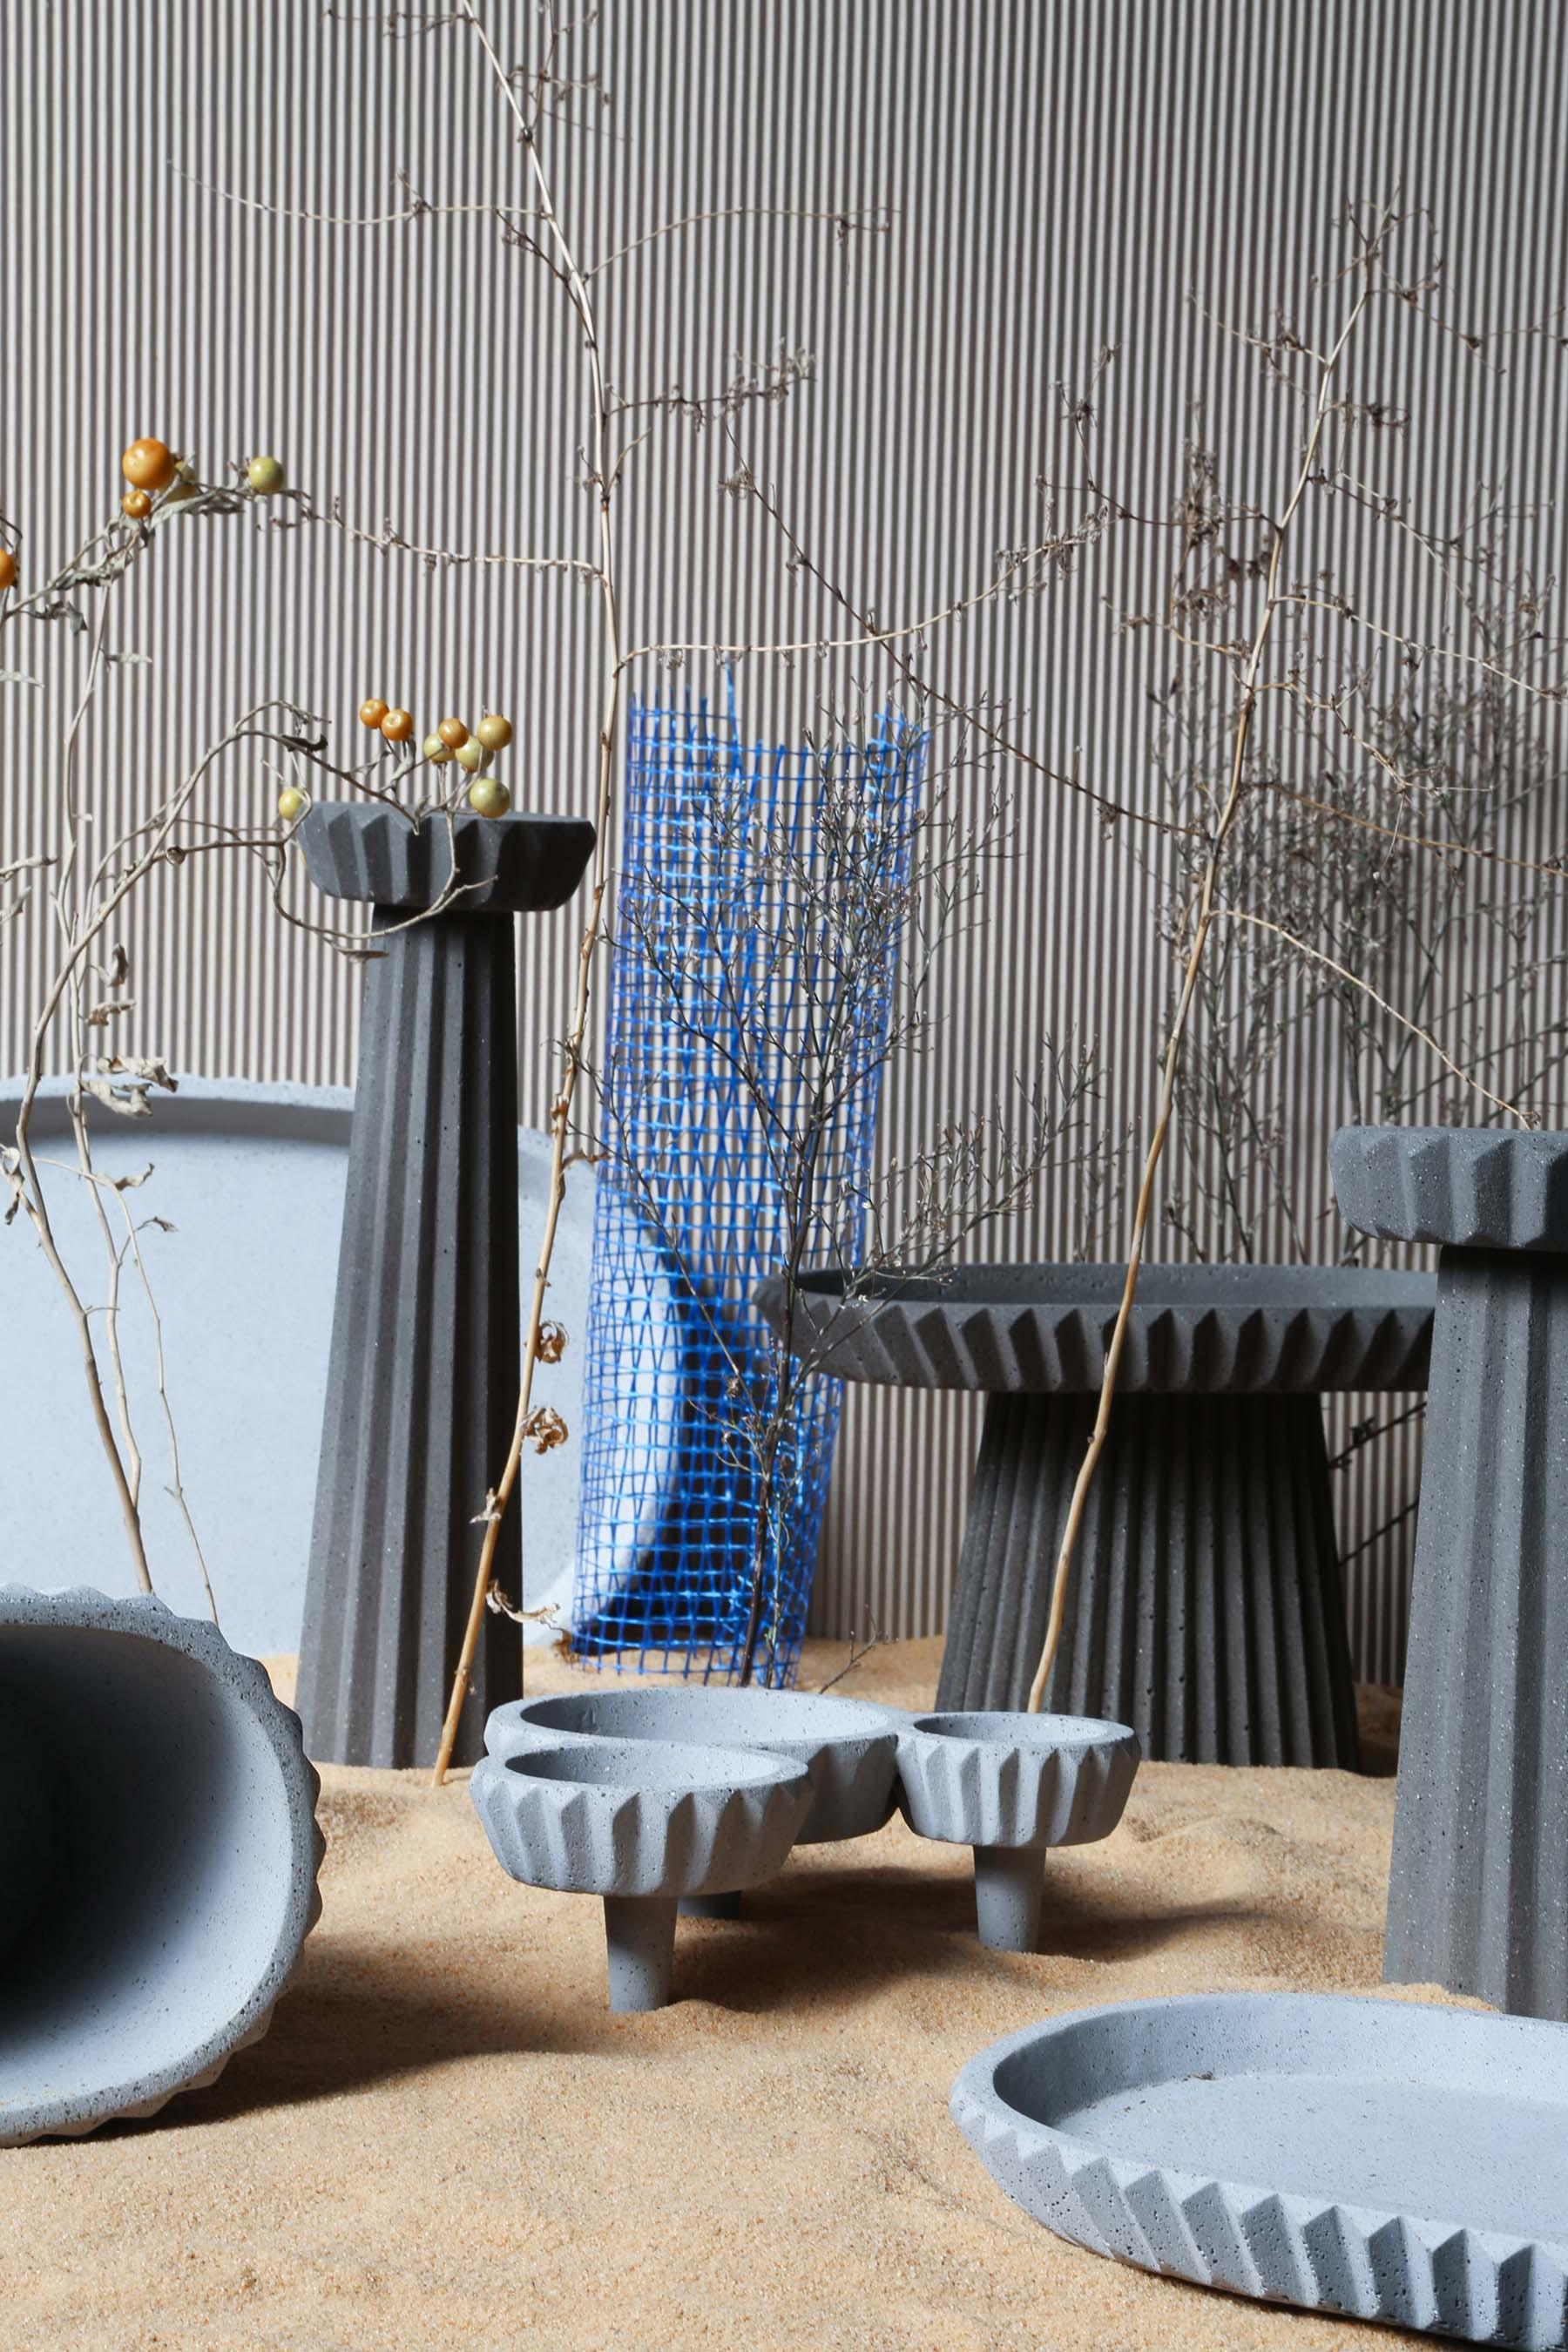 iGNANT-Design-Gian-Paulo-Venier-Siman-05